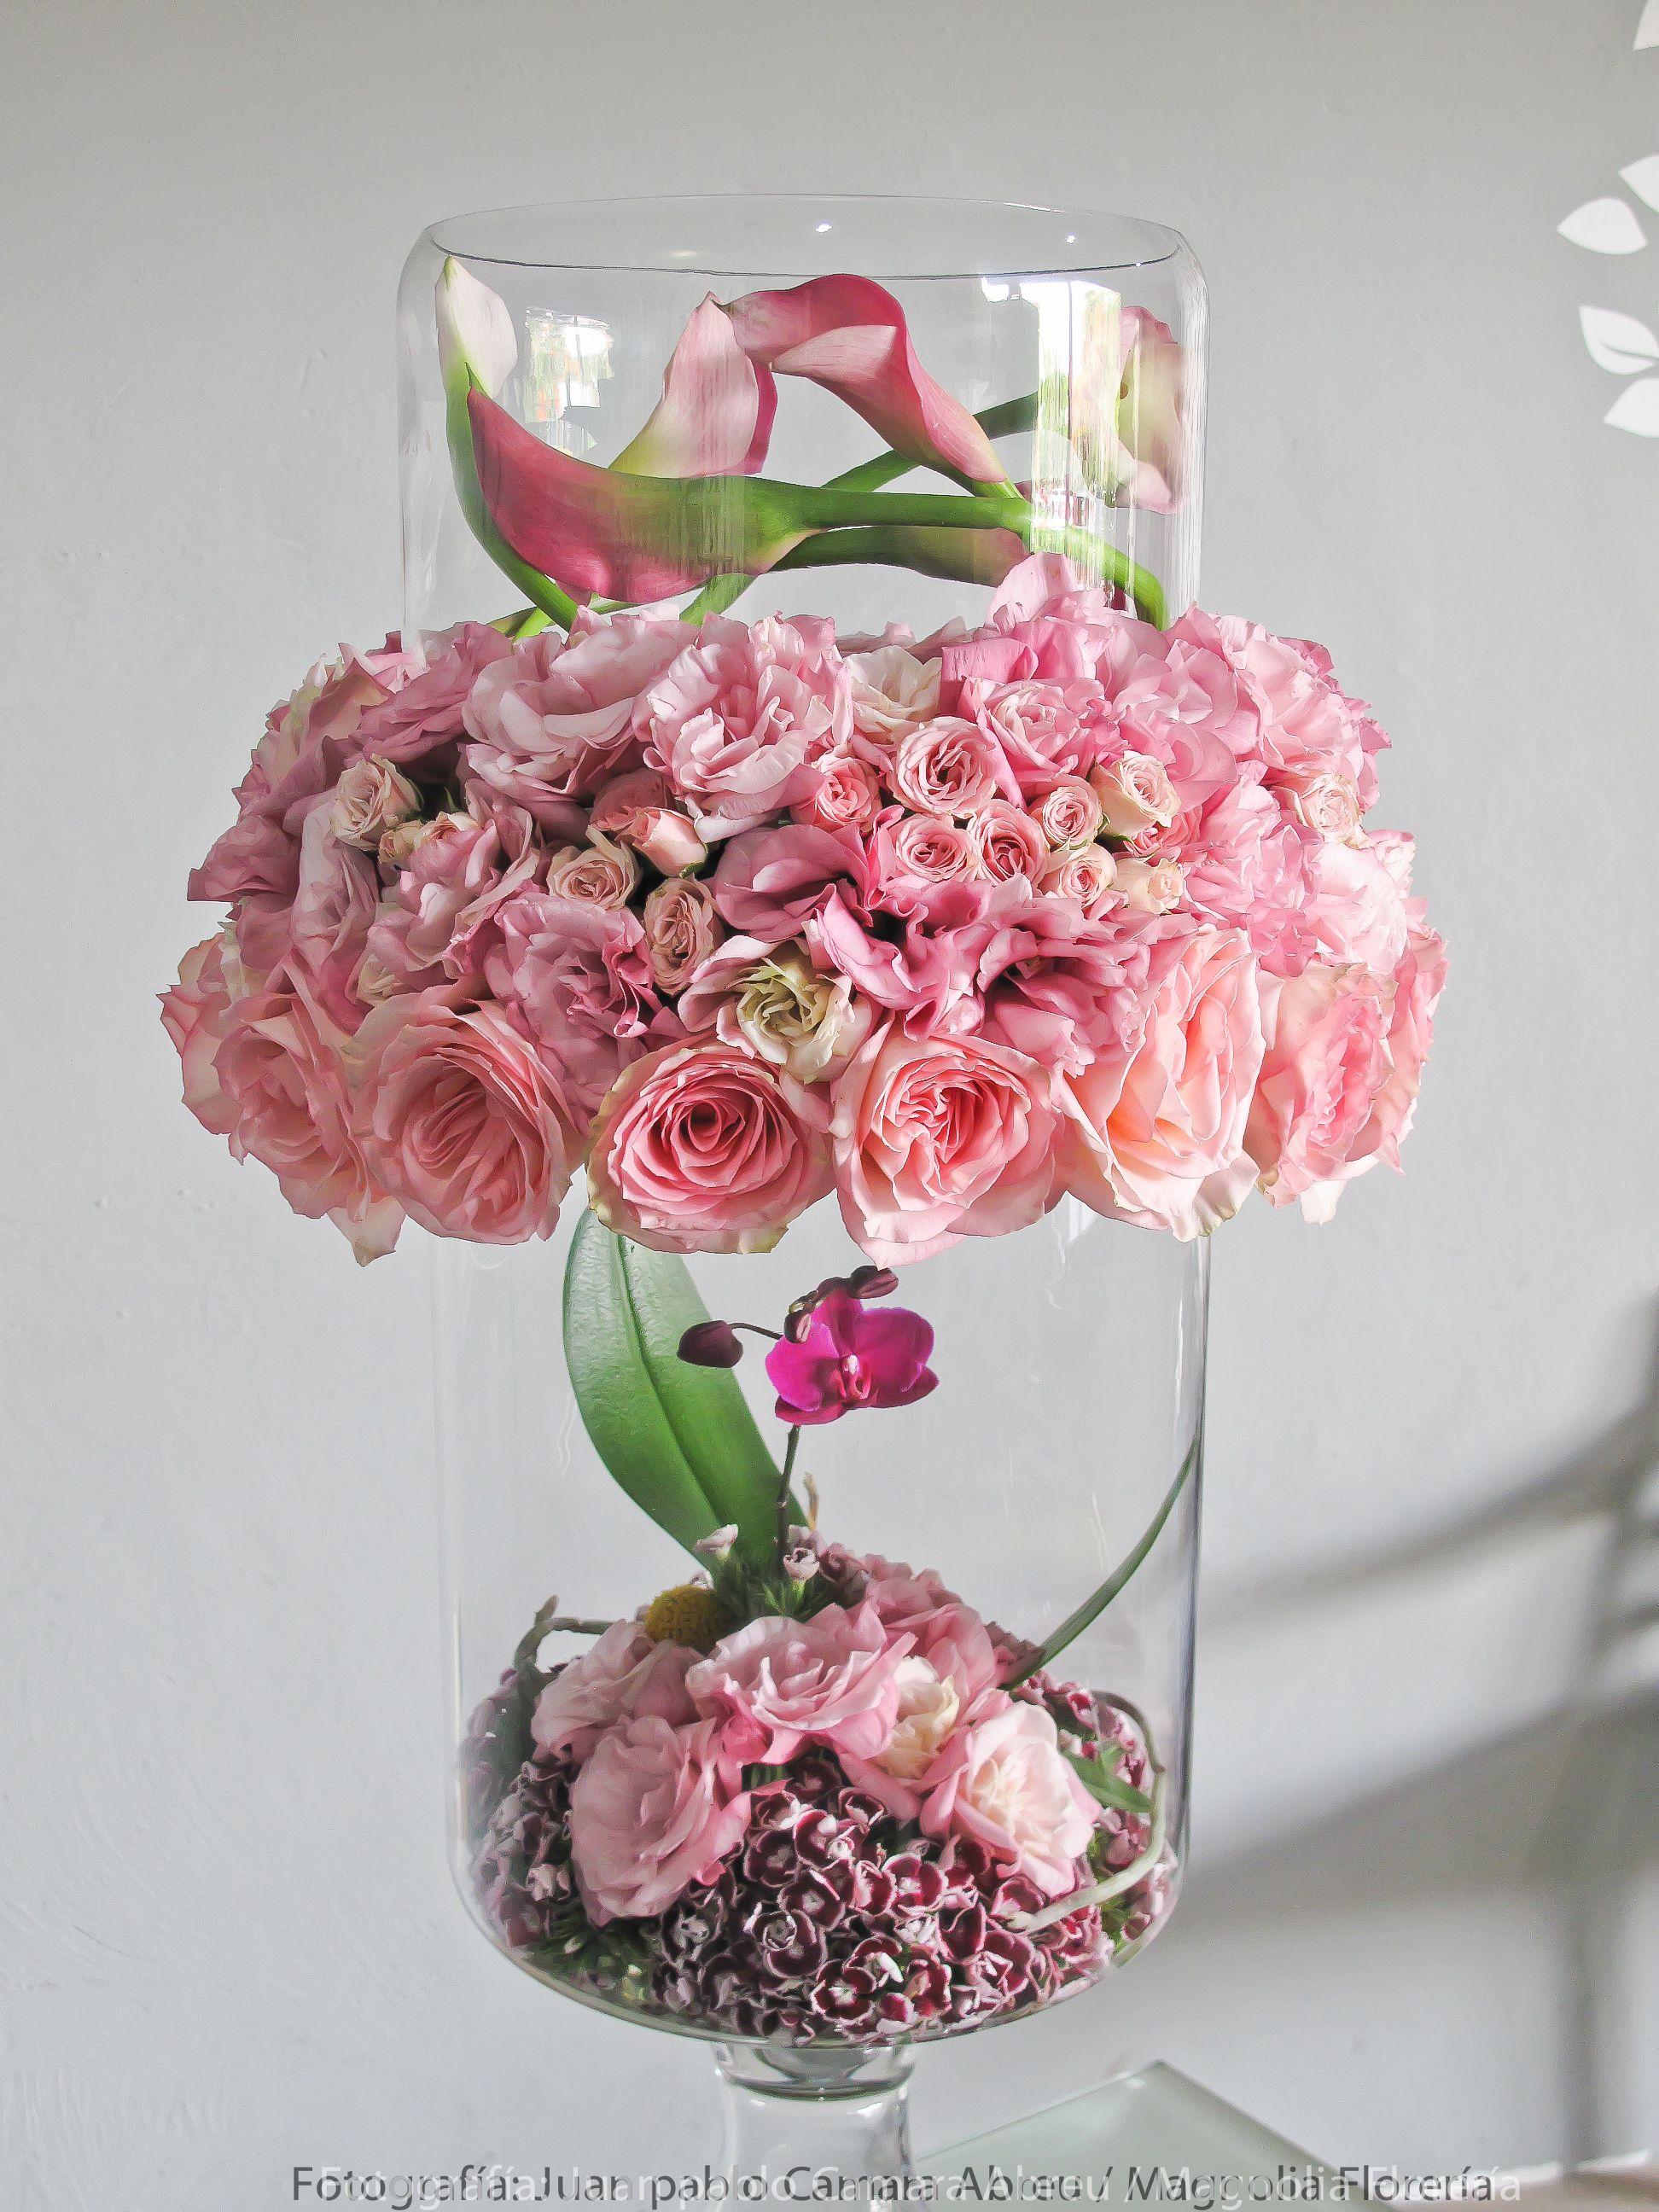 Pink Flower Arrangement By Juan Pablo Cmara Abreu Magnolia